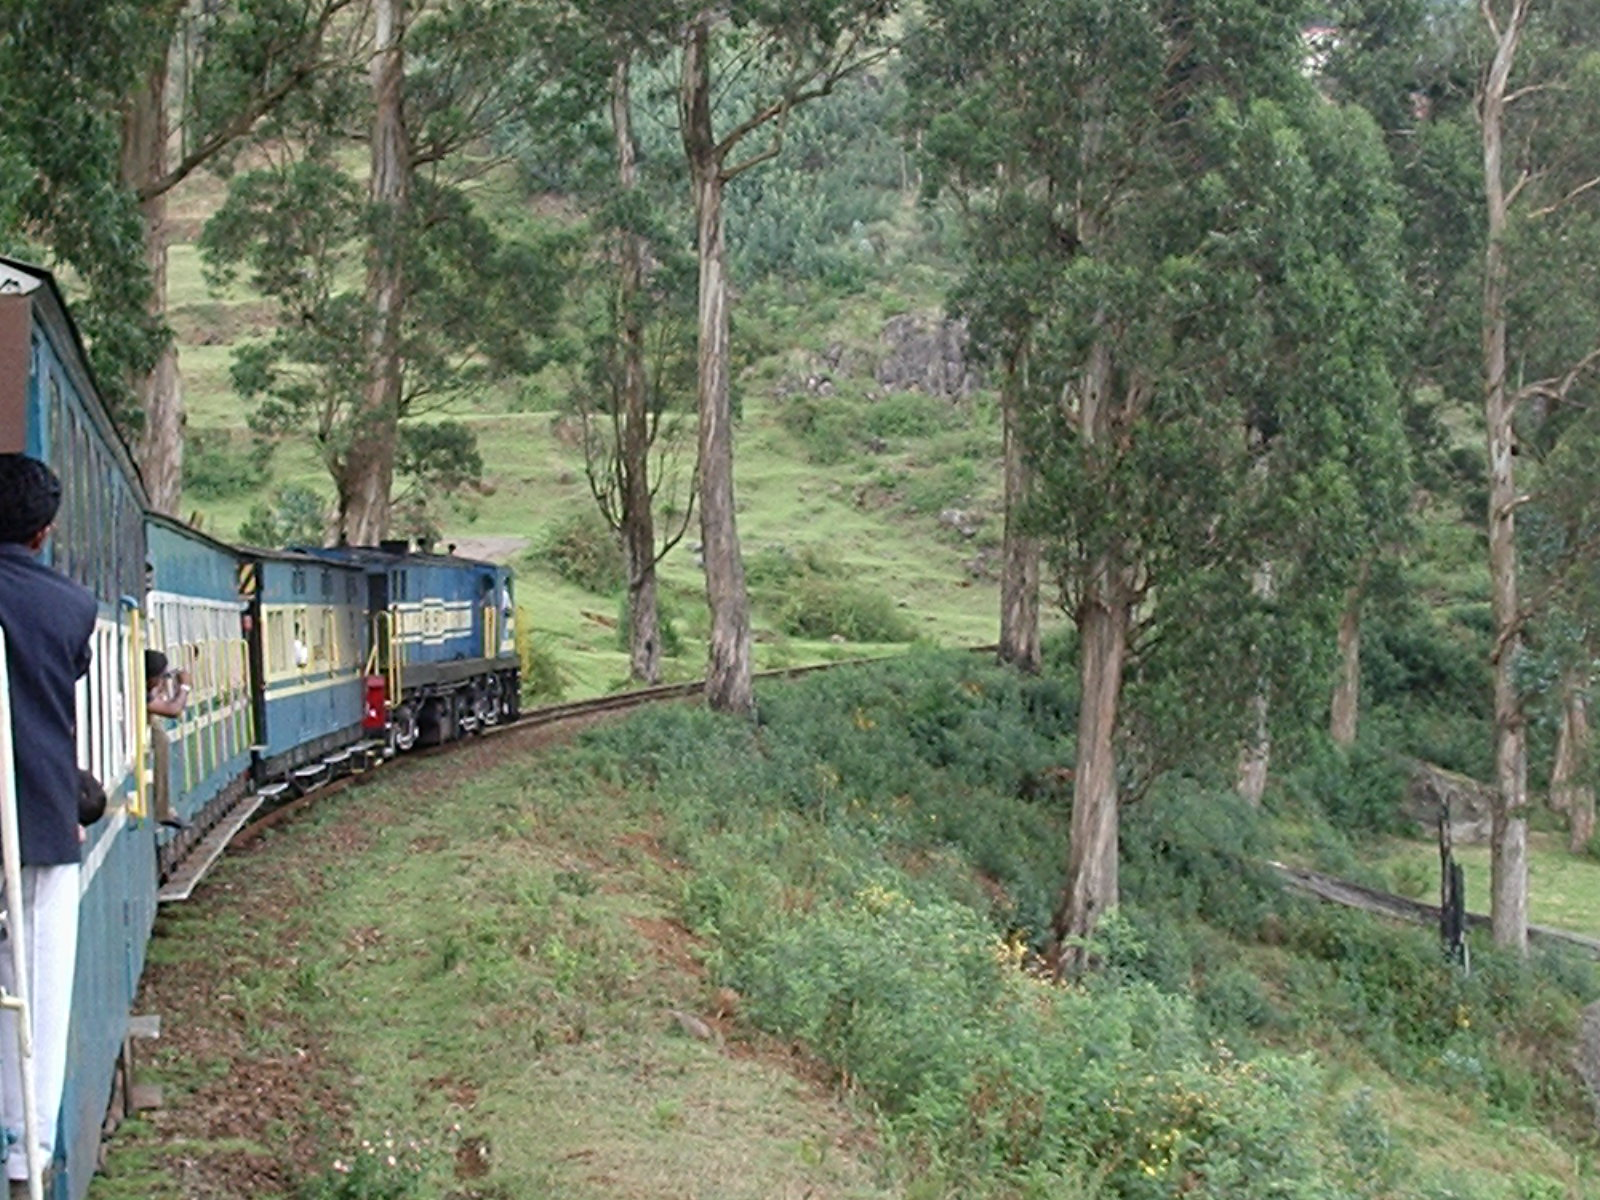 Nilgiri Mountain Railway Offbeat Attraction in Ooty - Video Reviews ...